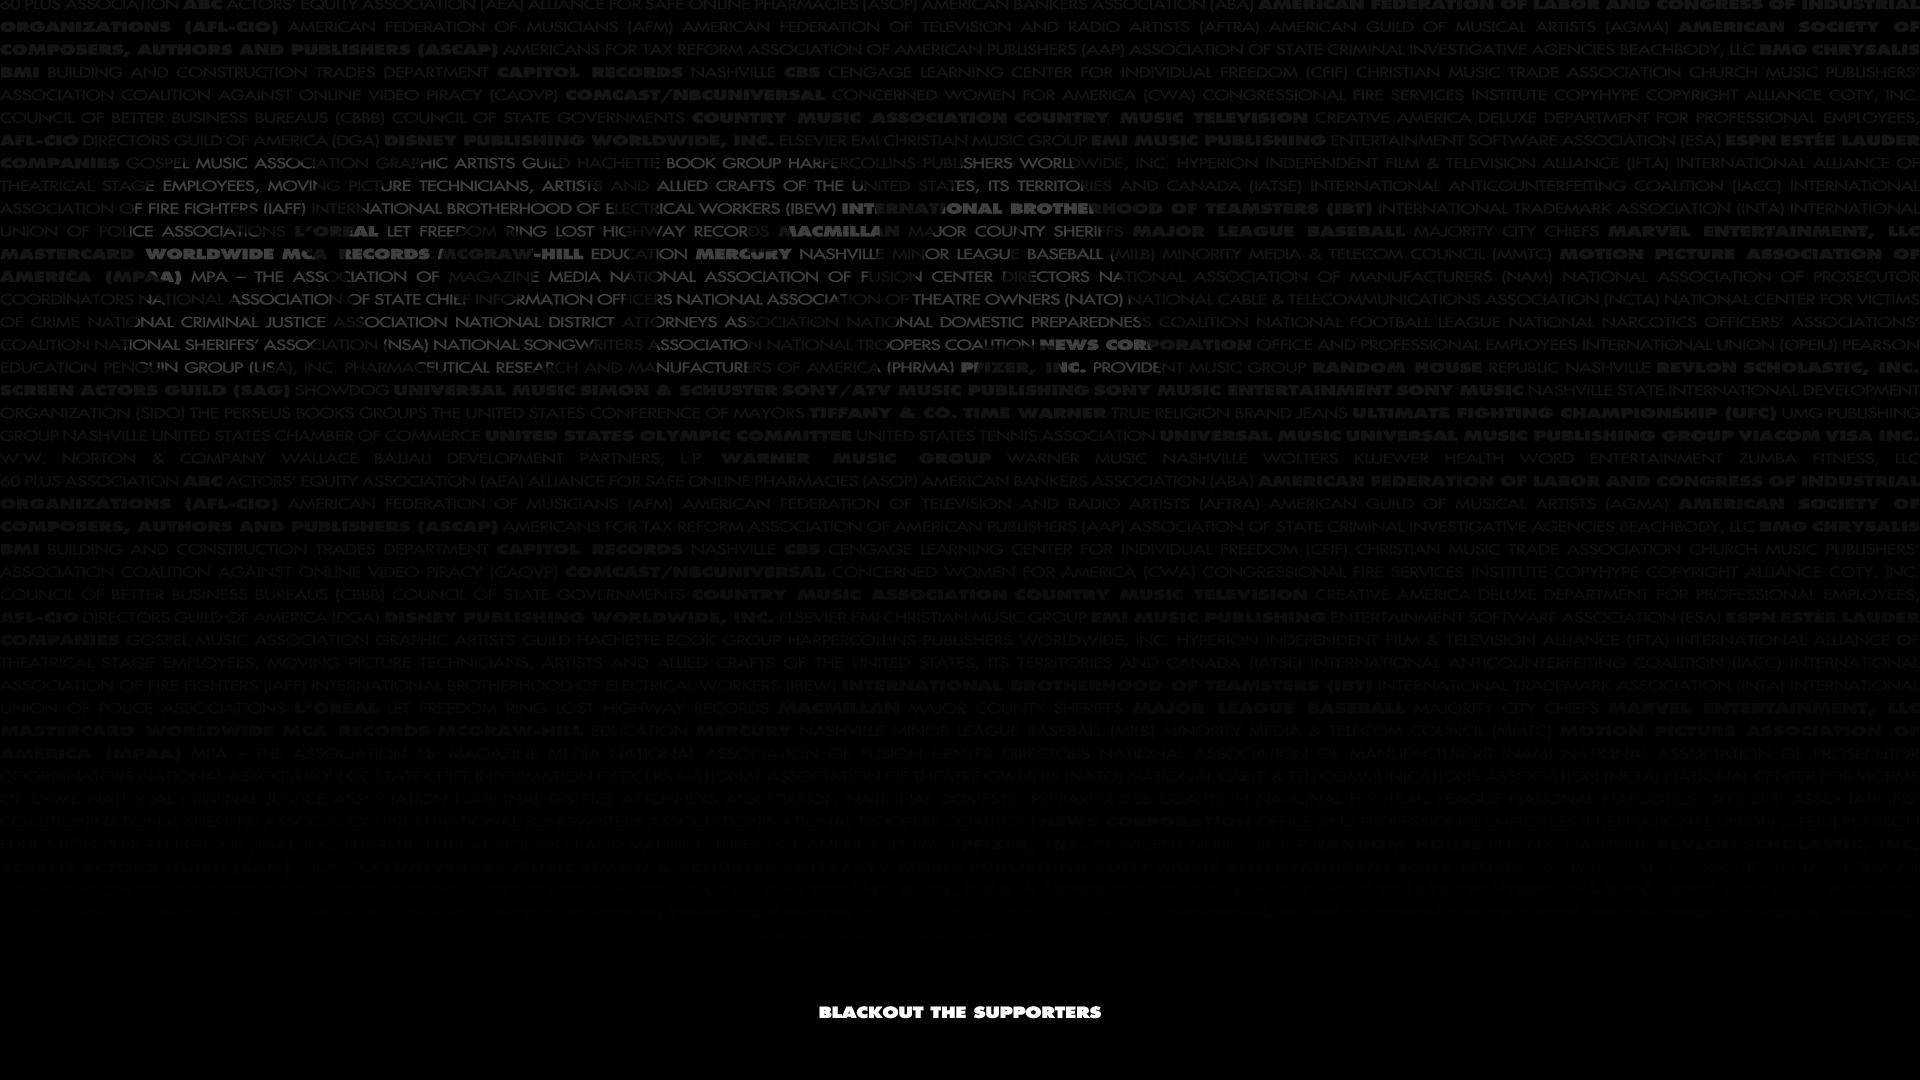 Best 51 Blackout Background on HipWallpaper Blackout BlackBerry 1920x1080